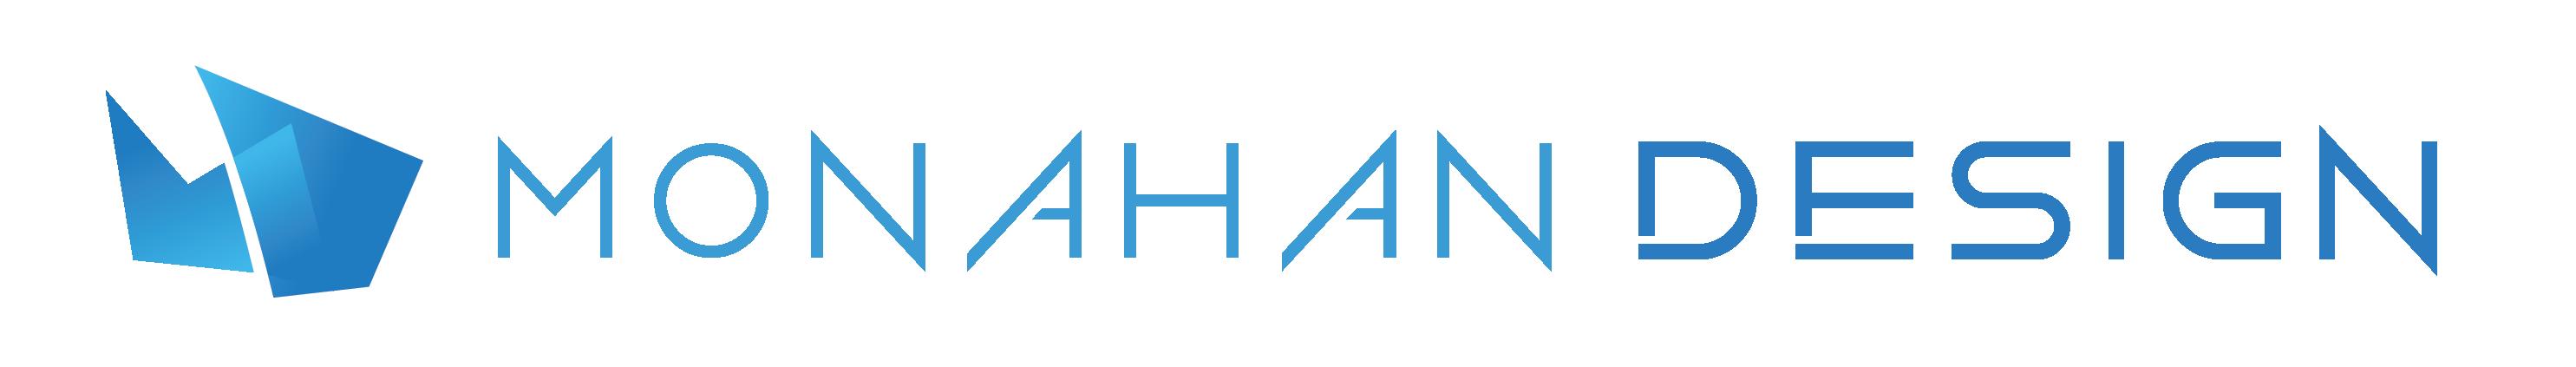 Monahan Design